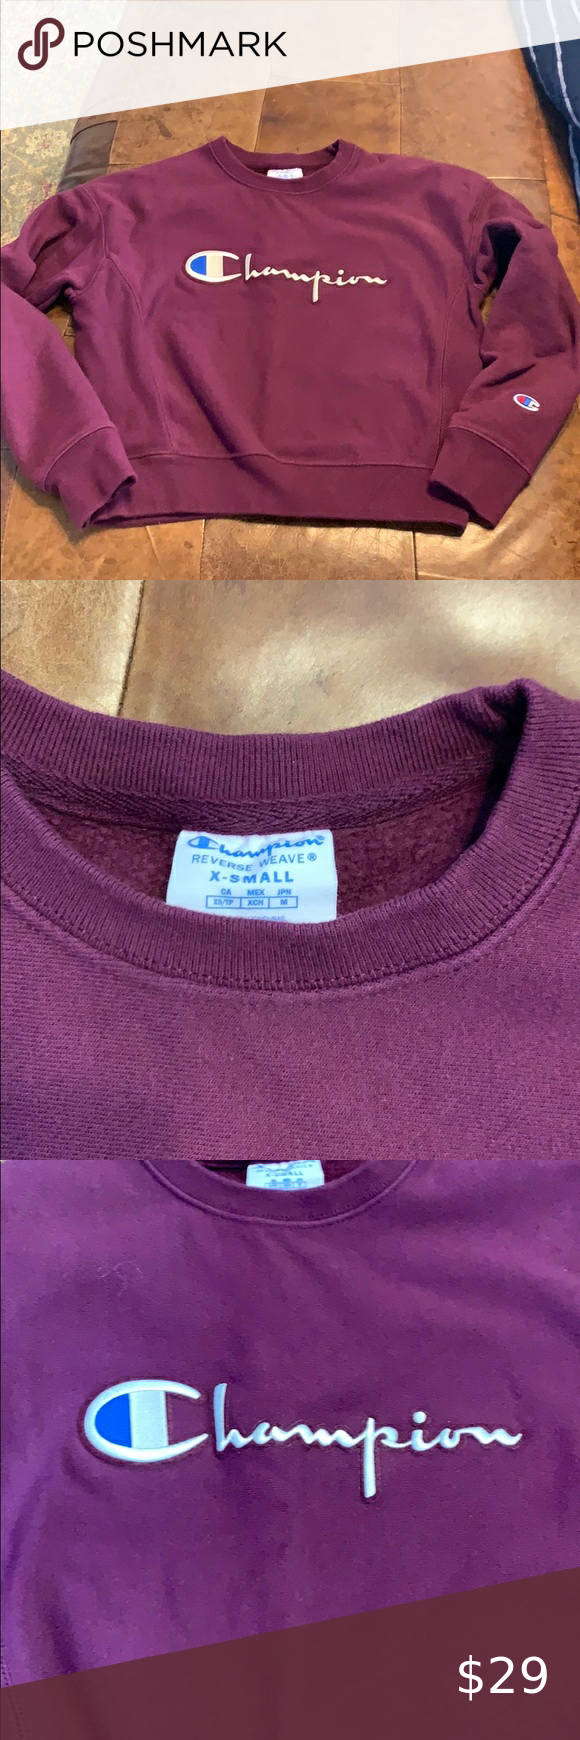 Champion Reverse Weave Sweatshirt Burgundy Women S Xs 20 5 Long Kinda Cropped From Urban Champion Reverse Weave Sweatshirt Sweatshirts Champion Reverse Weave [ 1740 x 580 Pixel ]